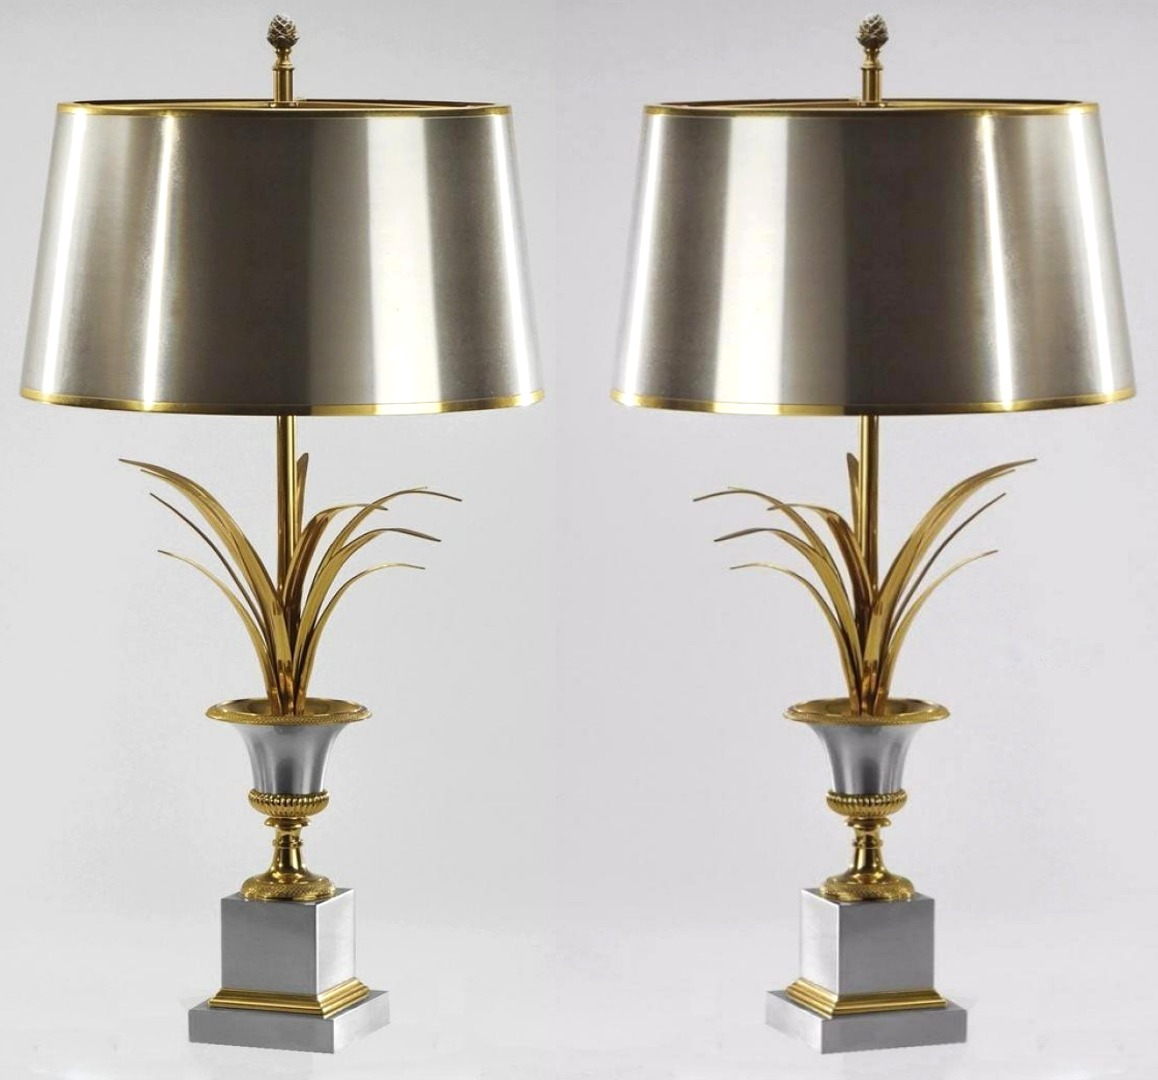 Recherche Grande Lampe De La Maison Charles Dite Ananas